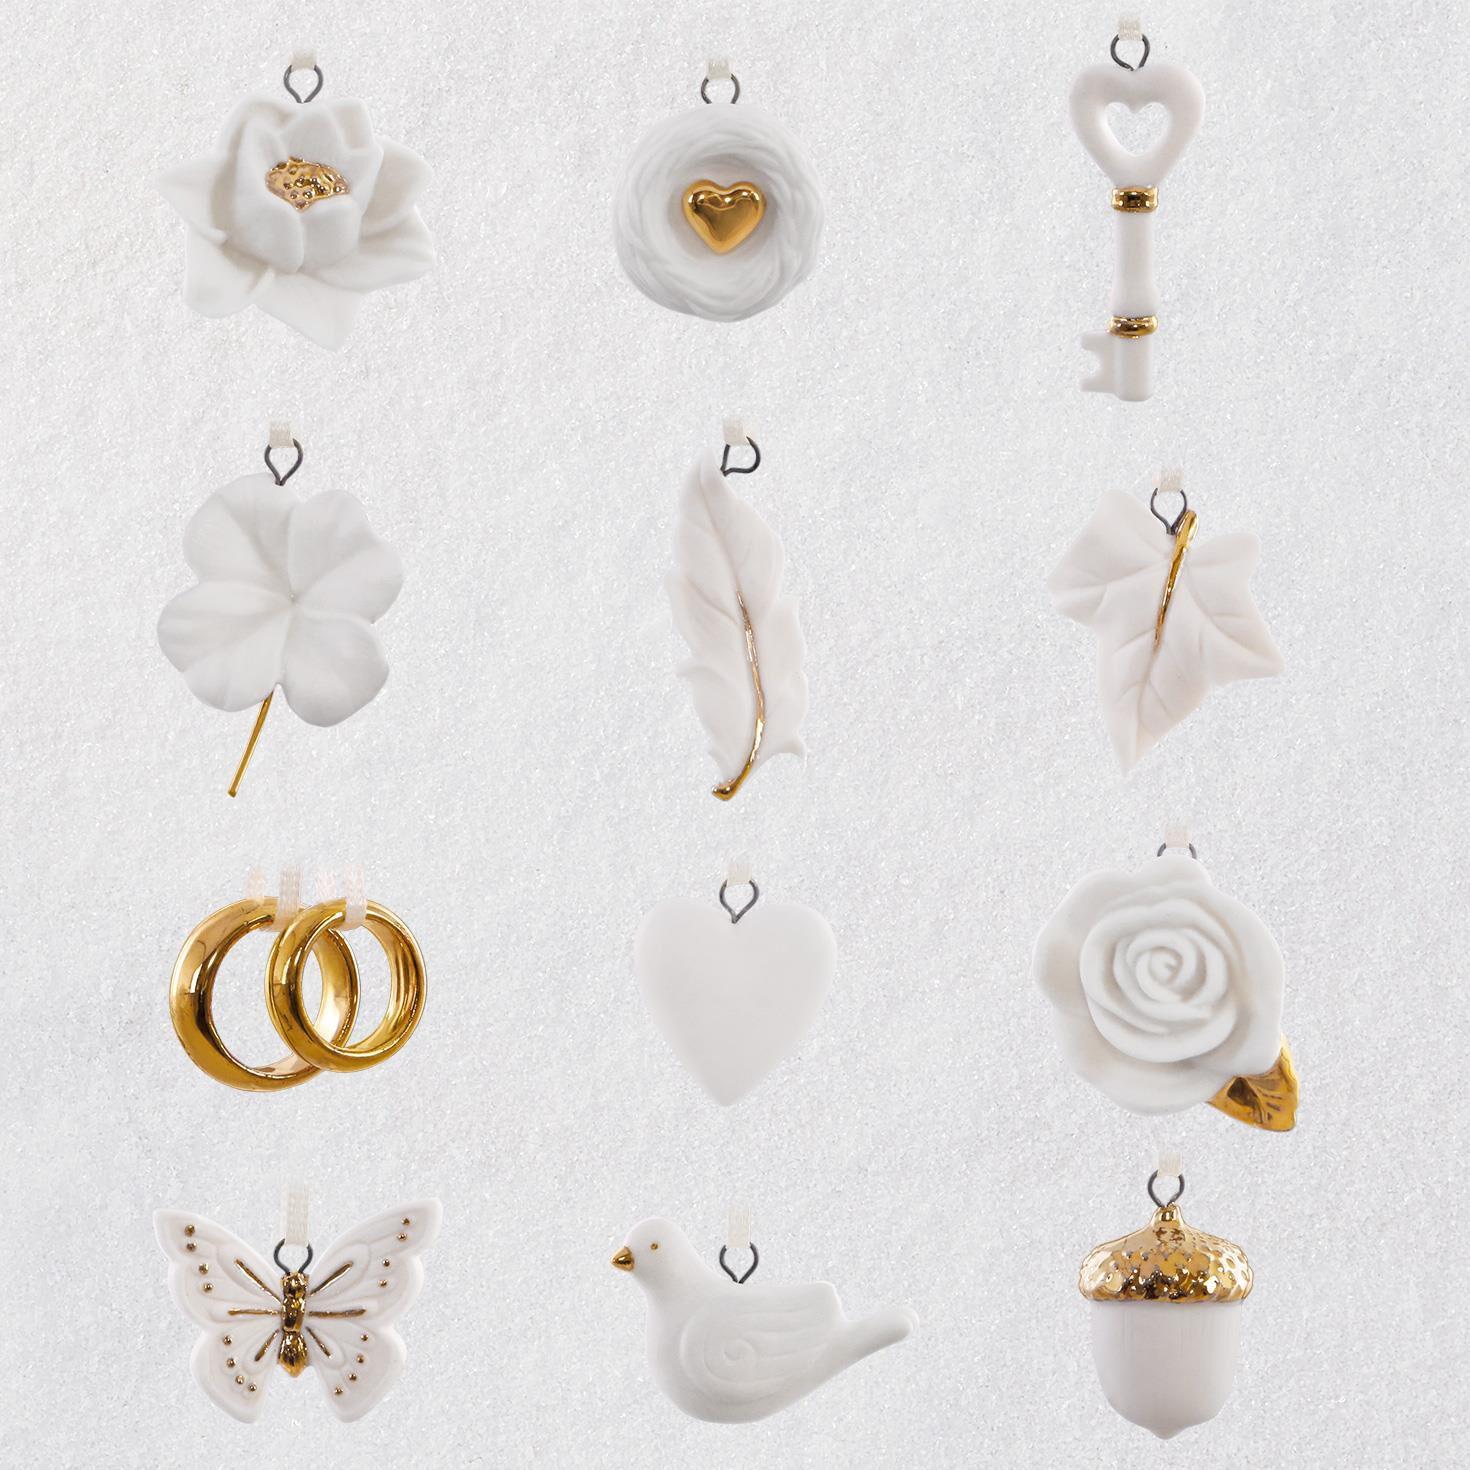 wedding wishes mini ornaments set of 12 keepsake ornaments hallmark